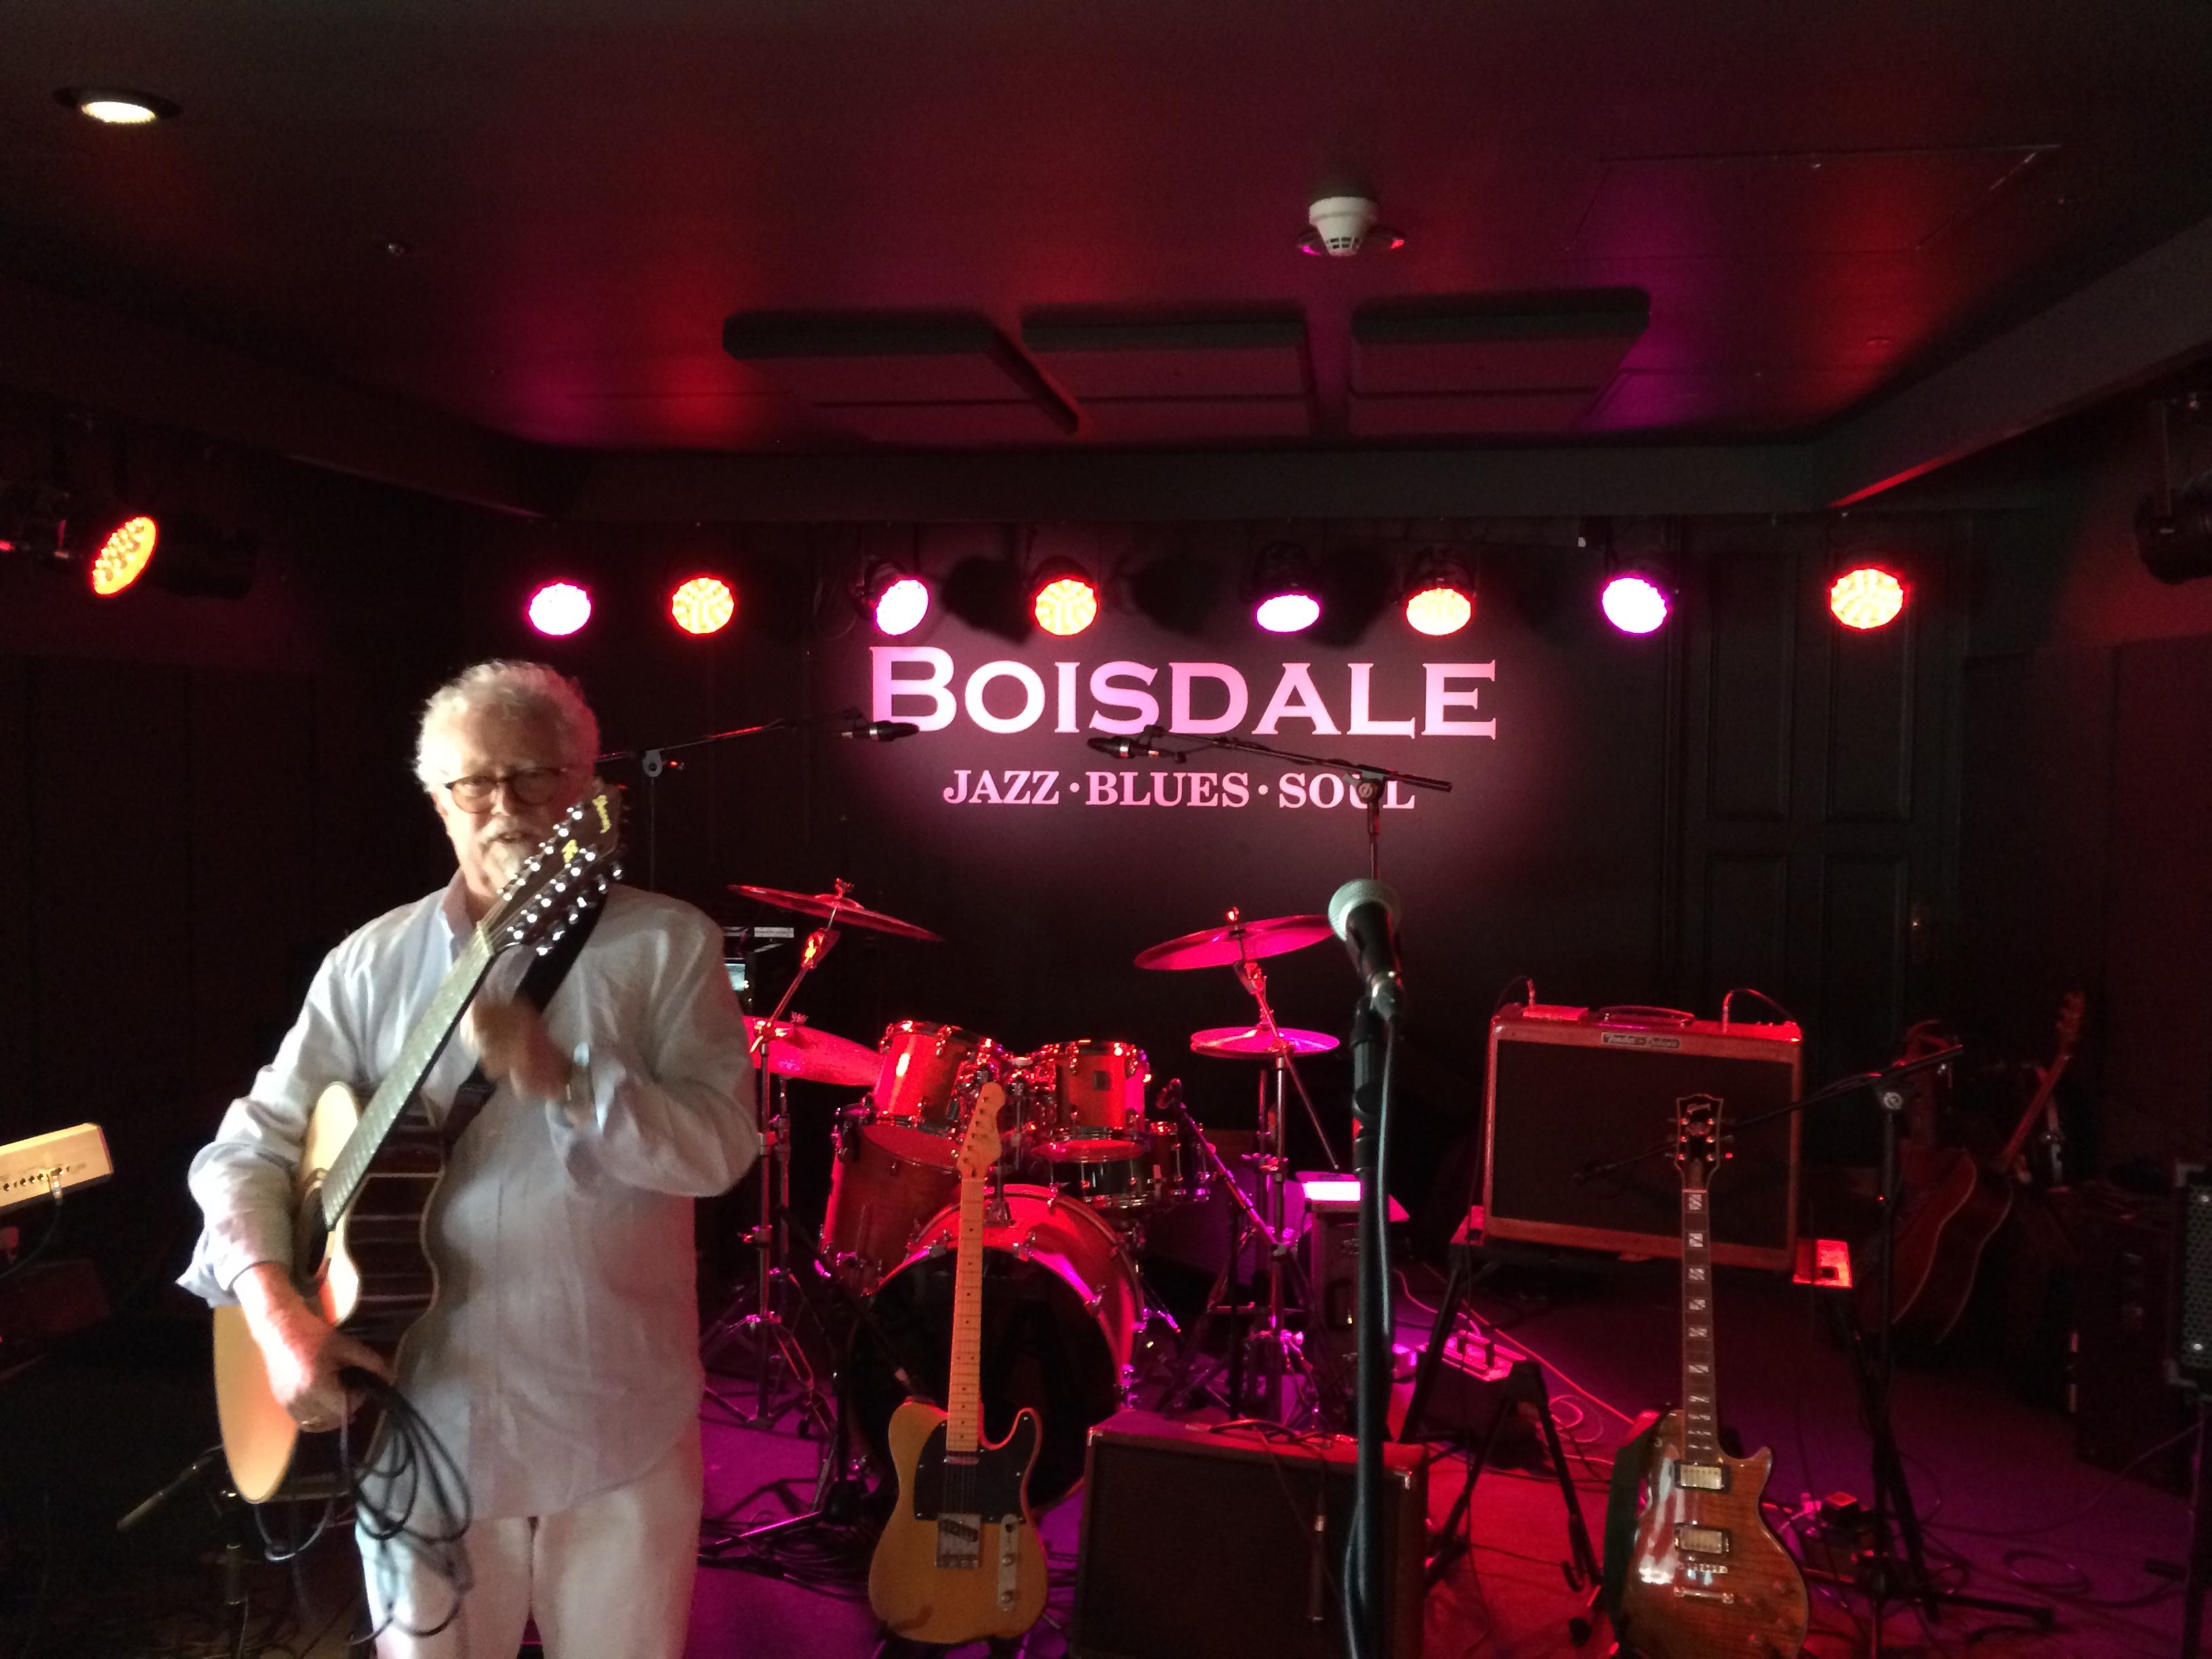 Jim (Boisdale)